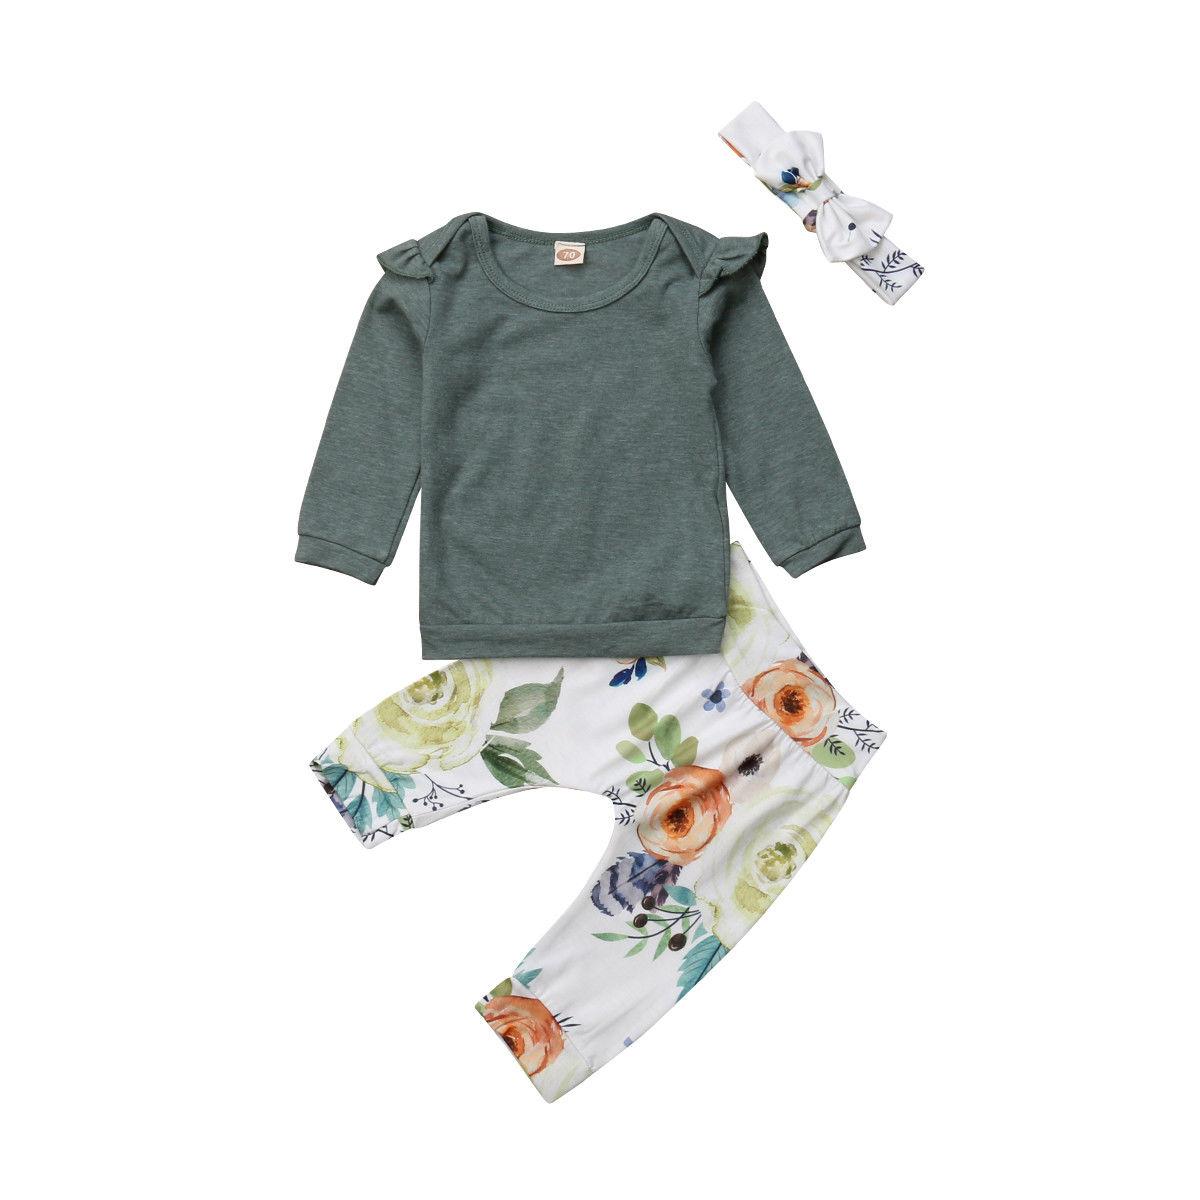 Newborn Baby Girls Flower  Long Sleeve T-Shirt Tops Leggings Outfits Set Clothes